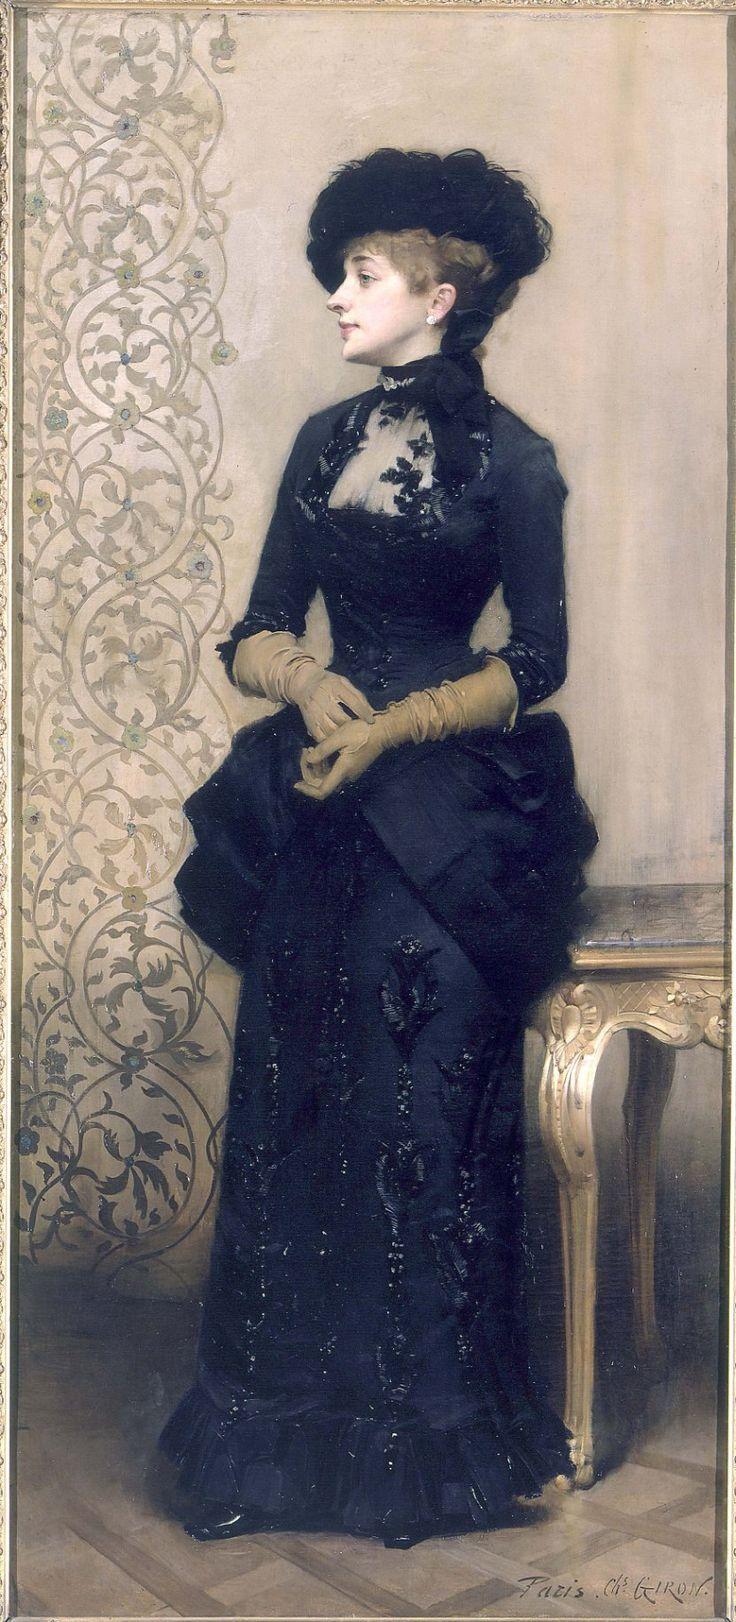 Charles-Alexandre Giron, La Parisienne, 1883